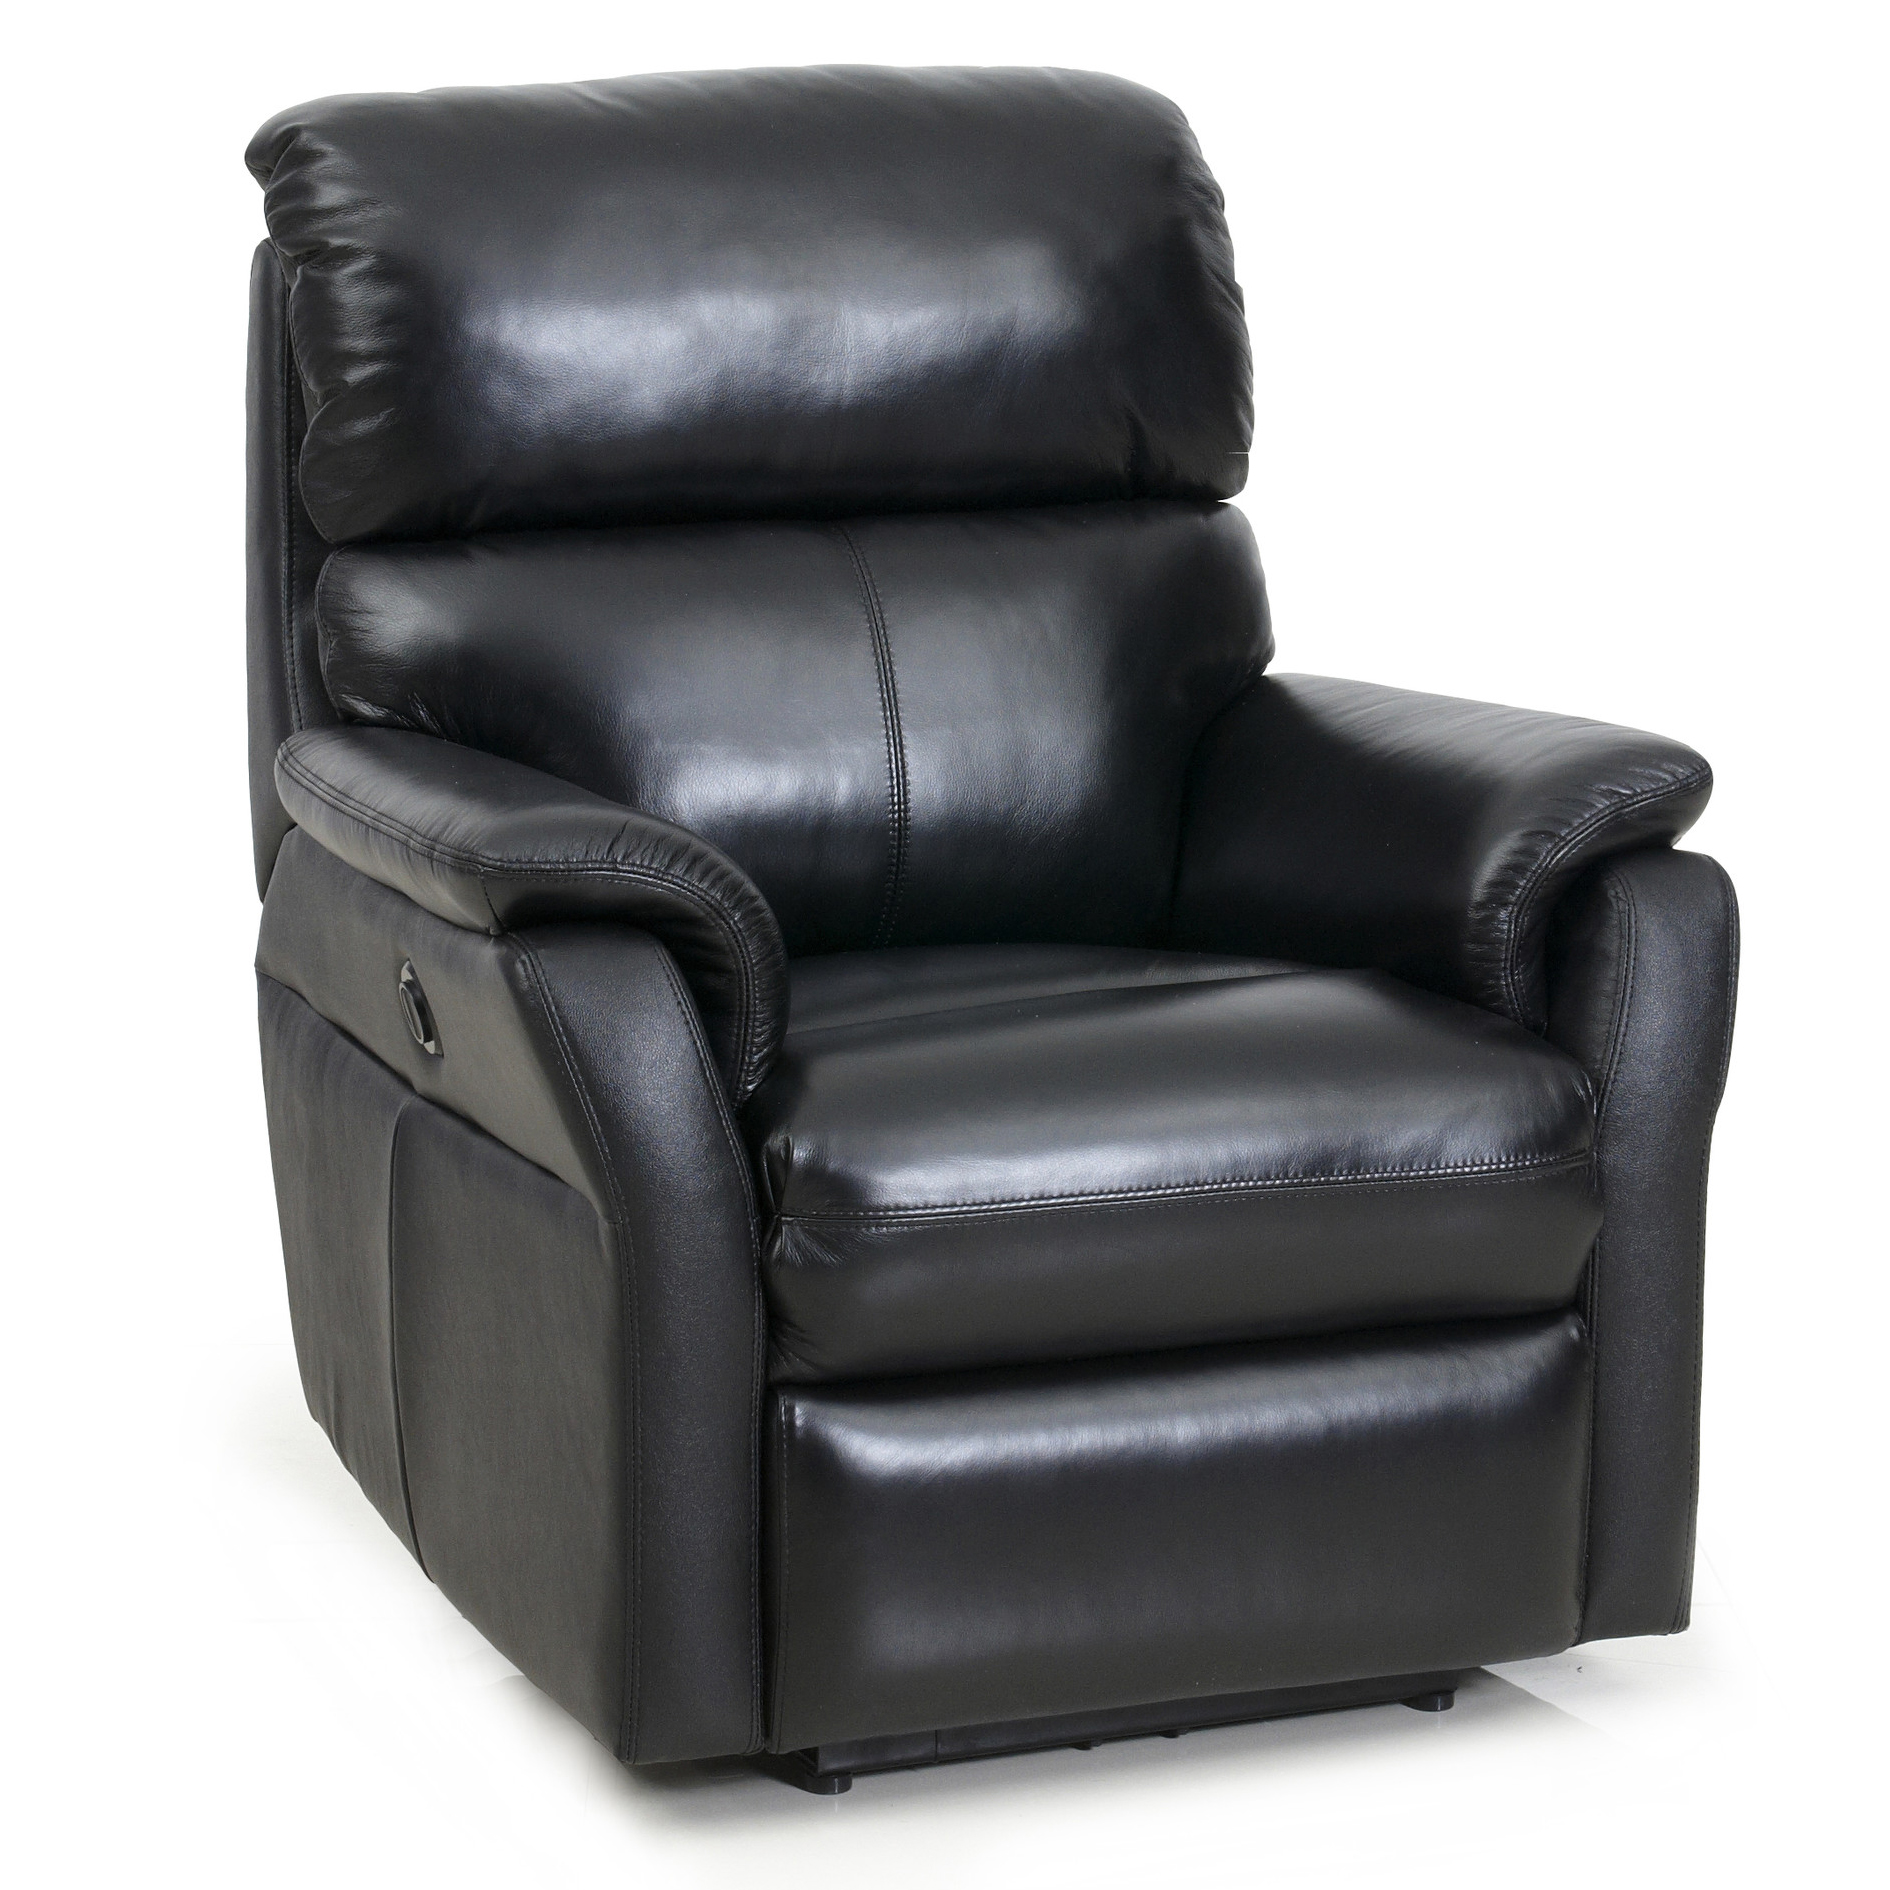 Barcalounger Black Cross II Chair Power Tivoli Leather  sc 1 st  Vitalityweb.com & Barcalounger Cross II Wall Proximity Hugger Lay Flat Recliner Chair ...